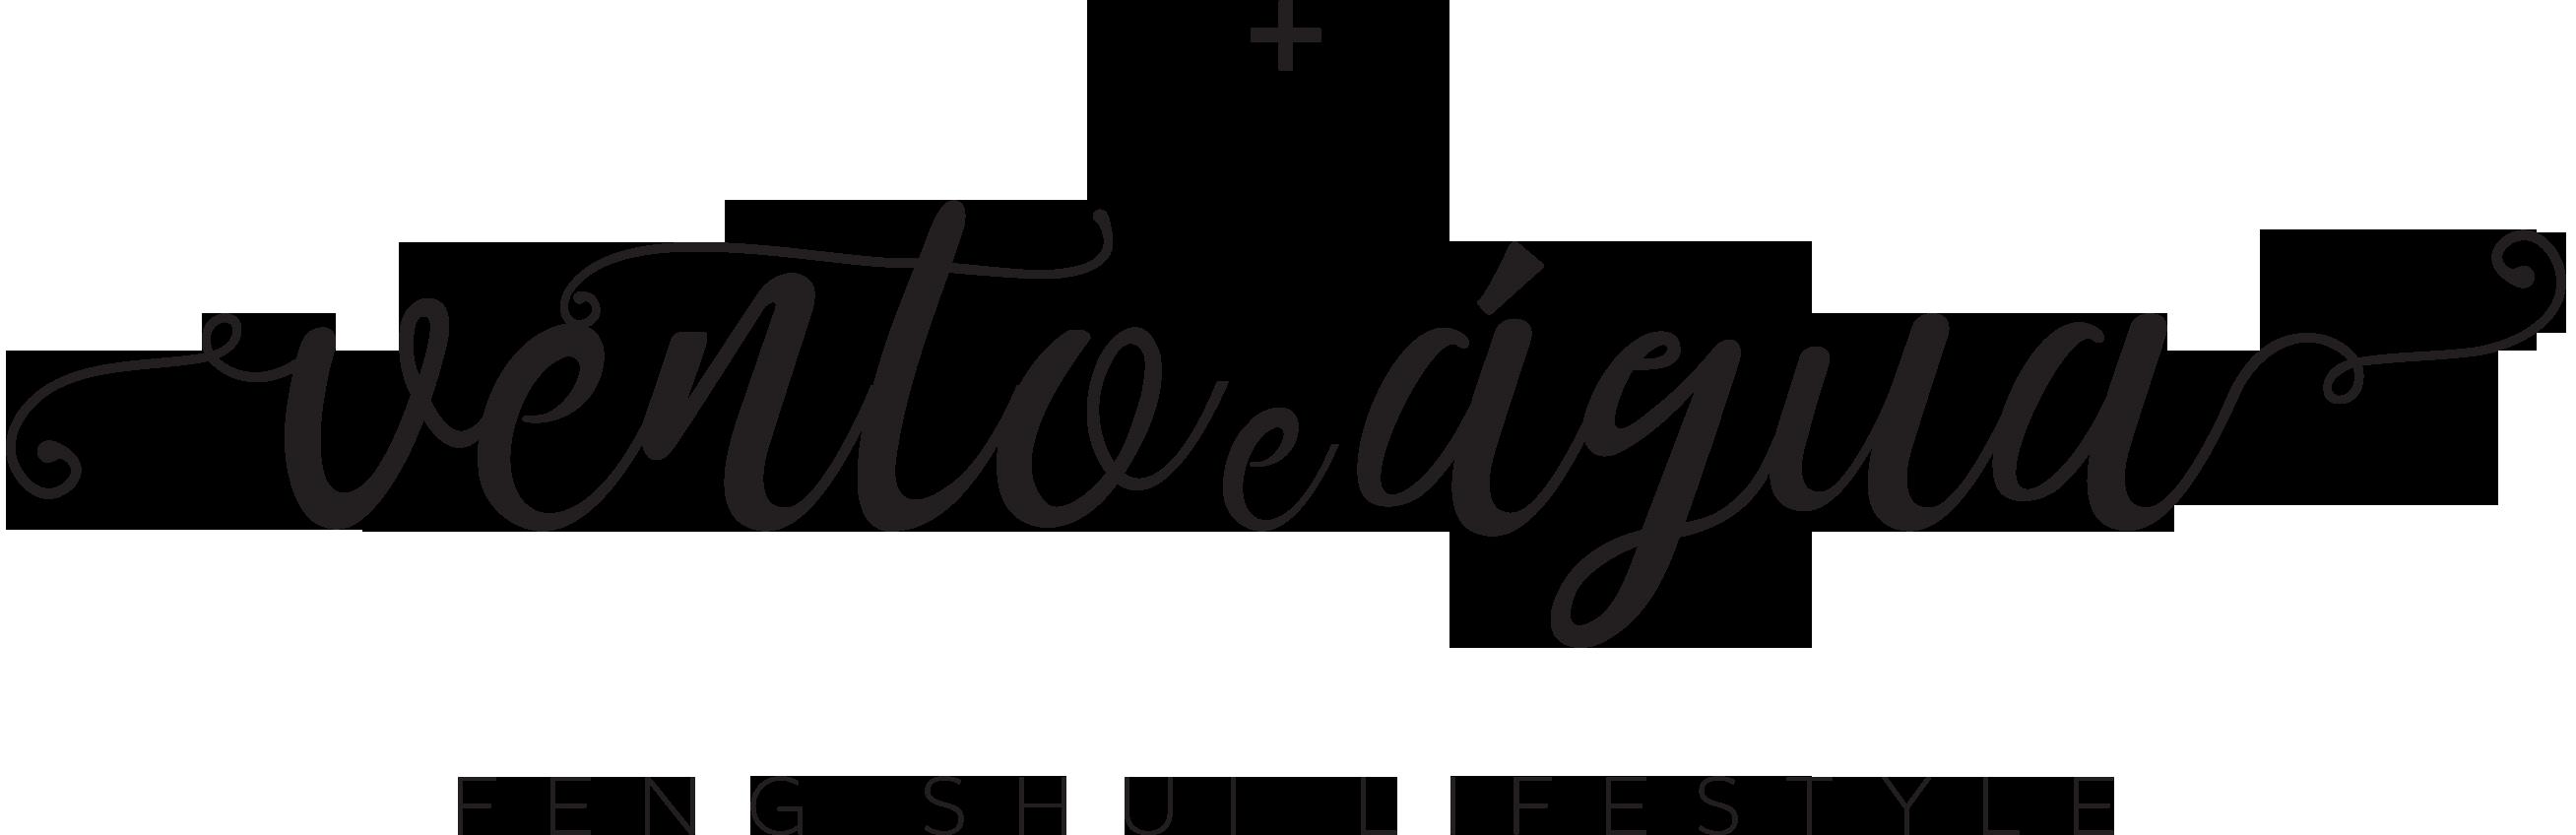 Vento e Água - Feng Shui Lifestyle